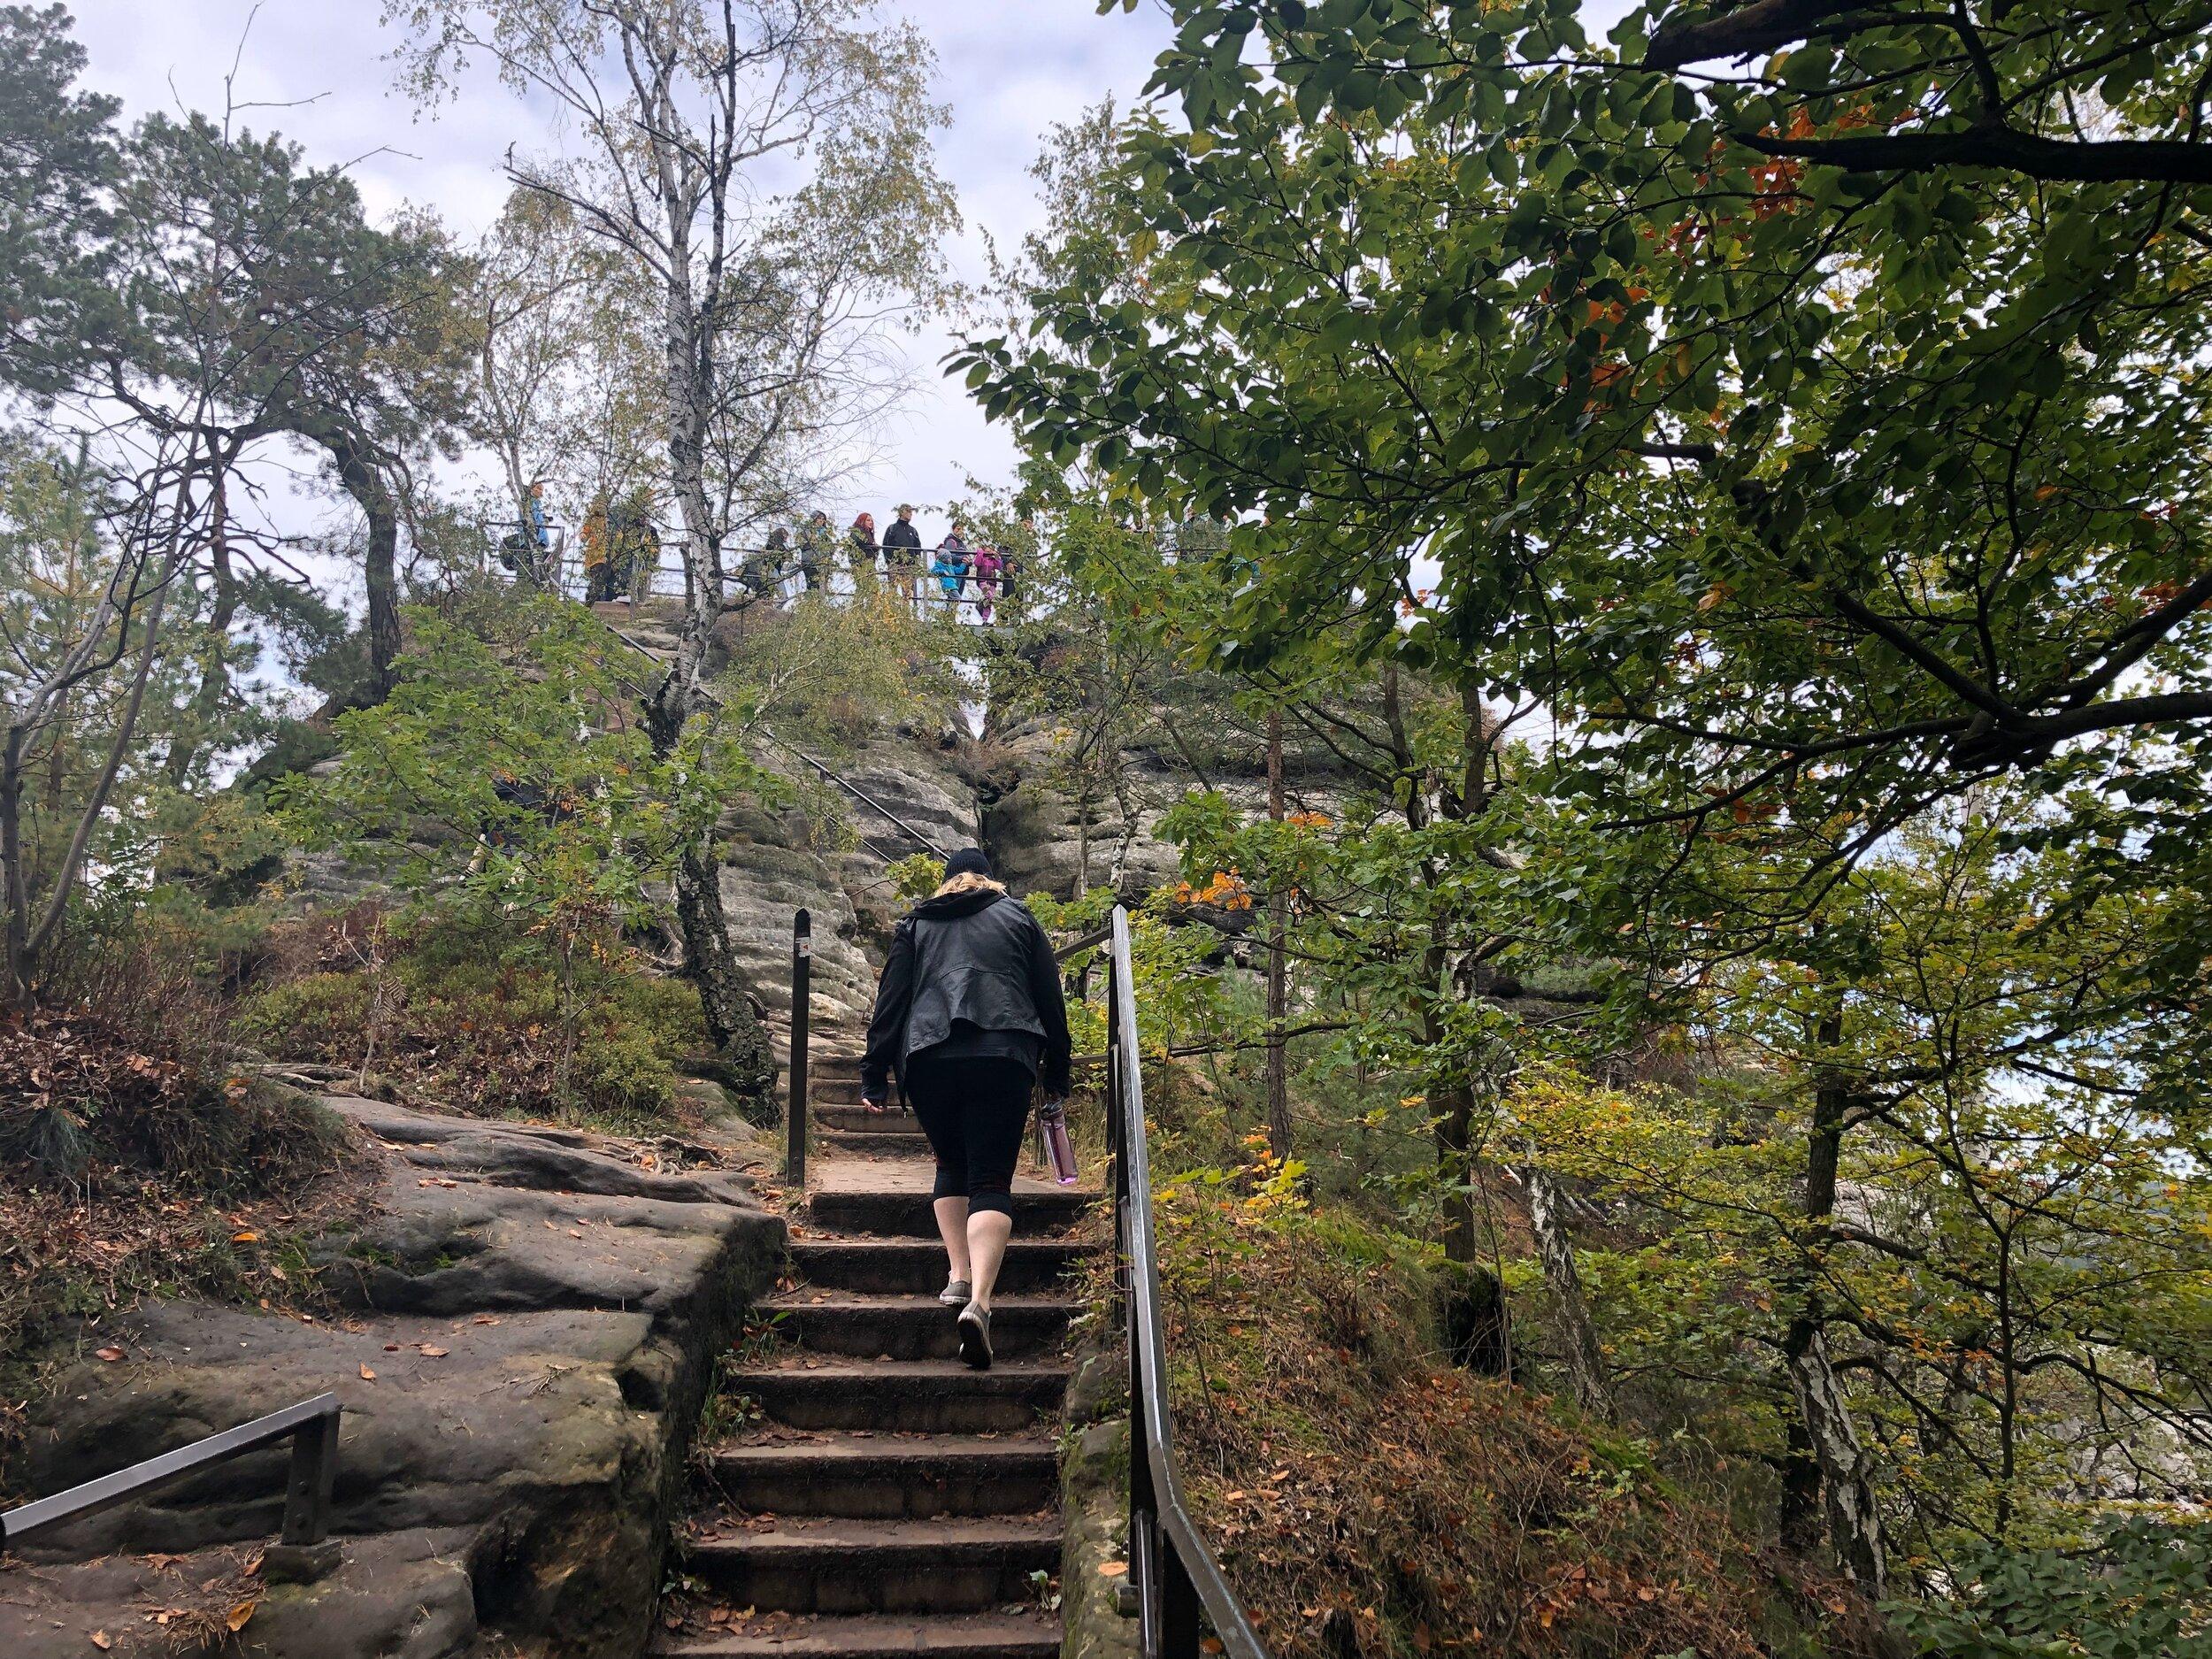 baste-bridge-lohmen-germany-hiking_0306.JPG